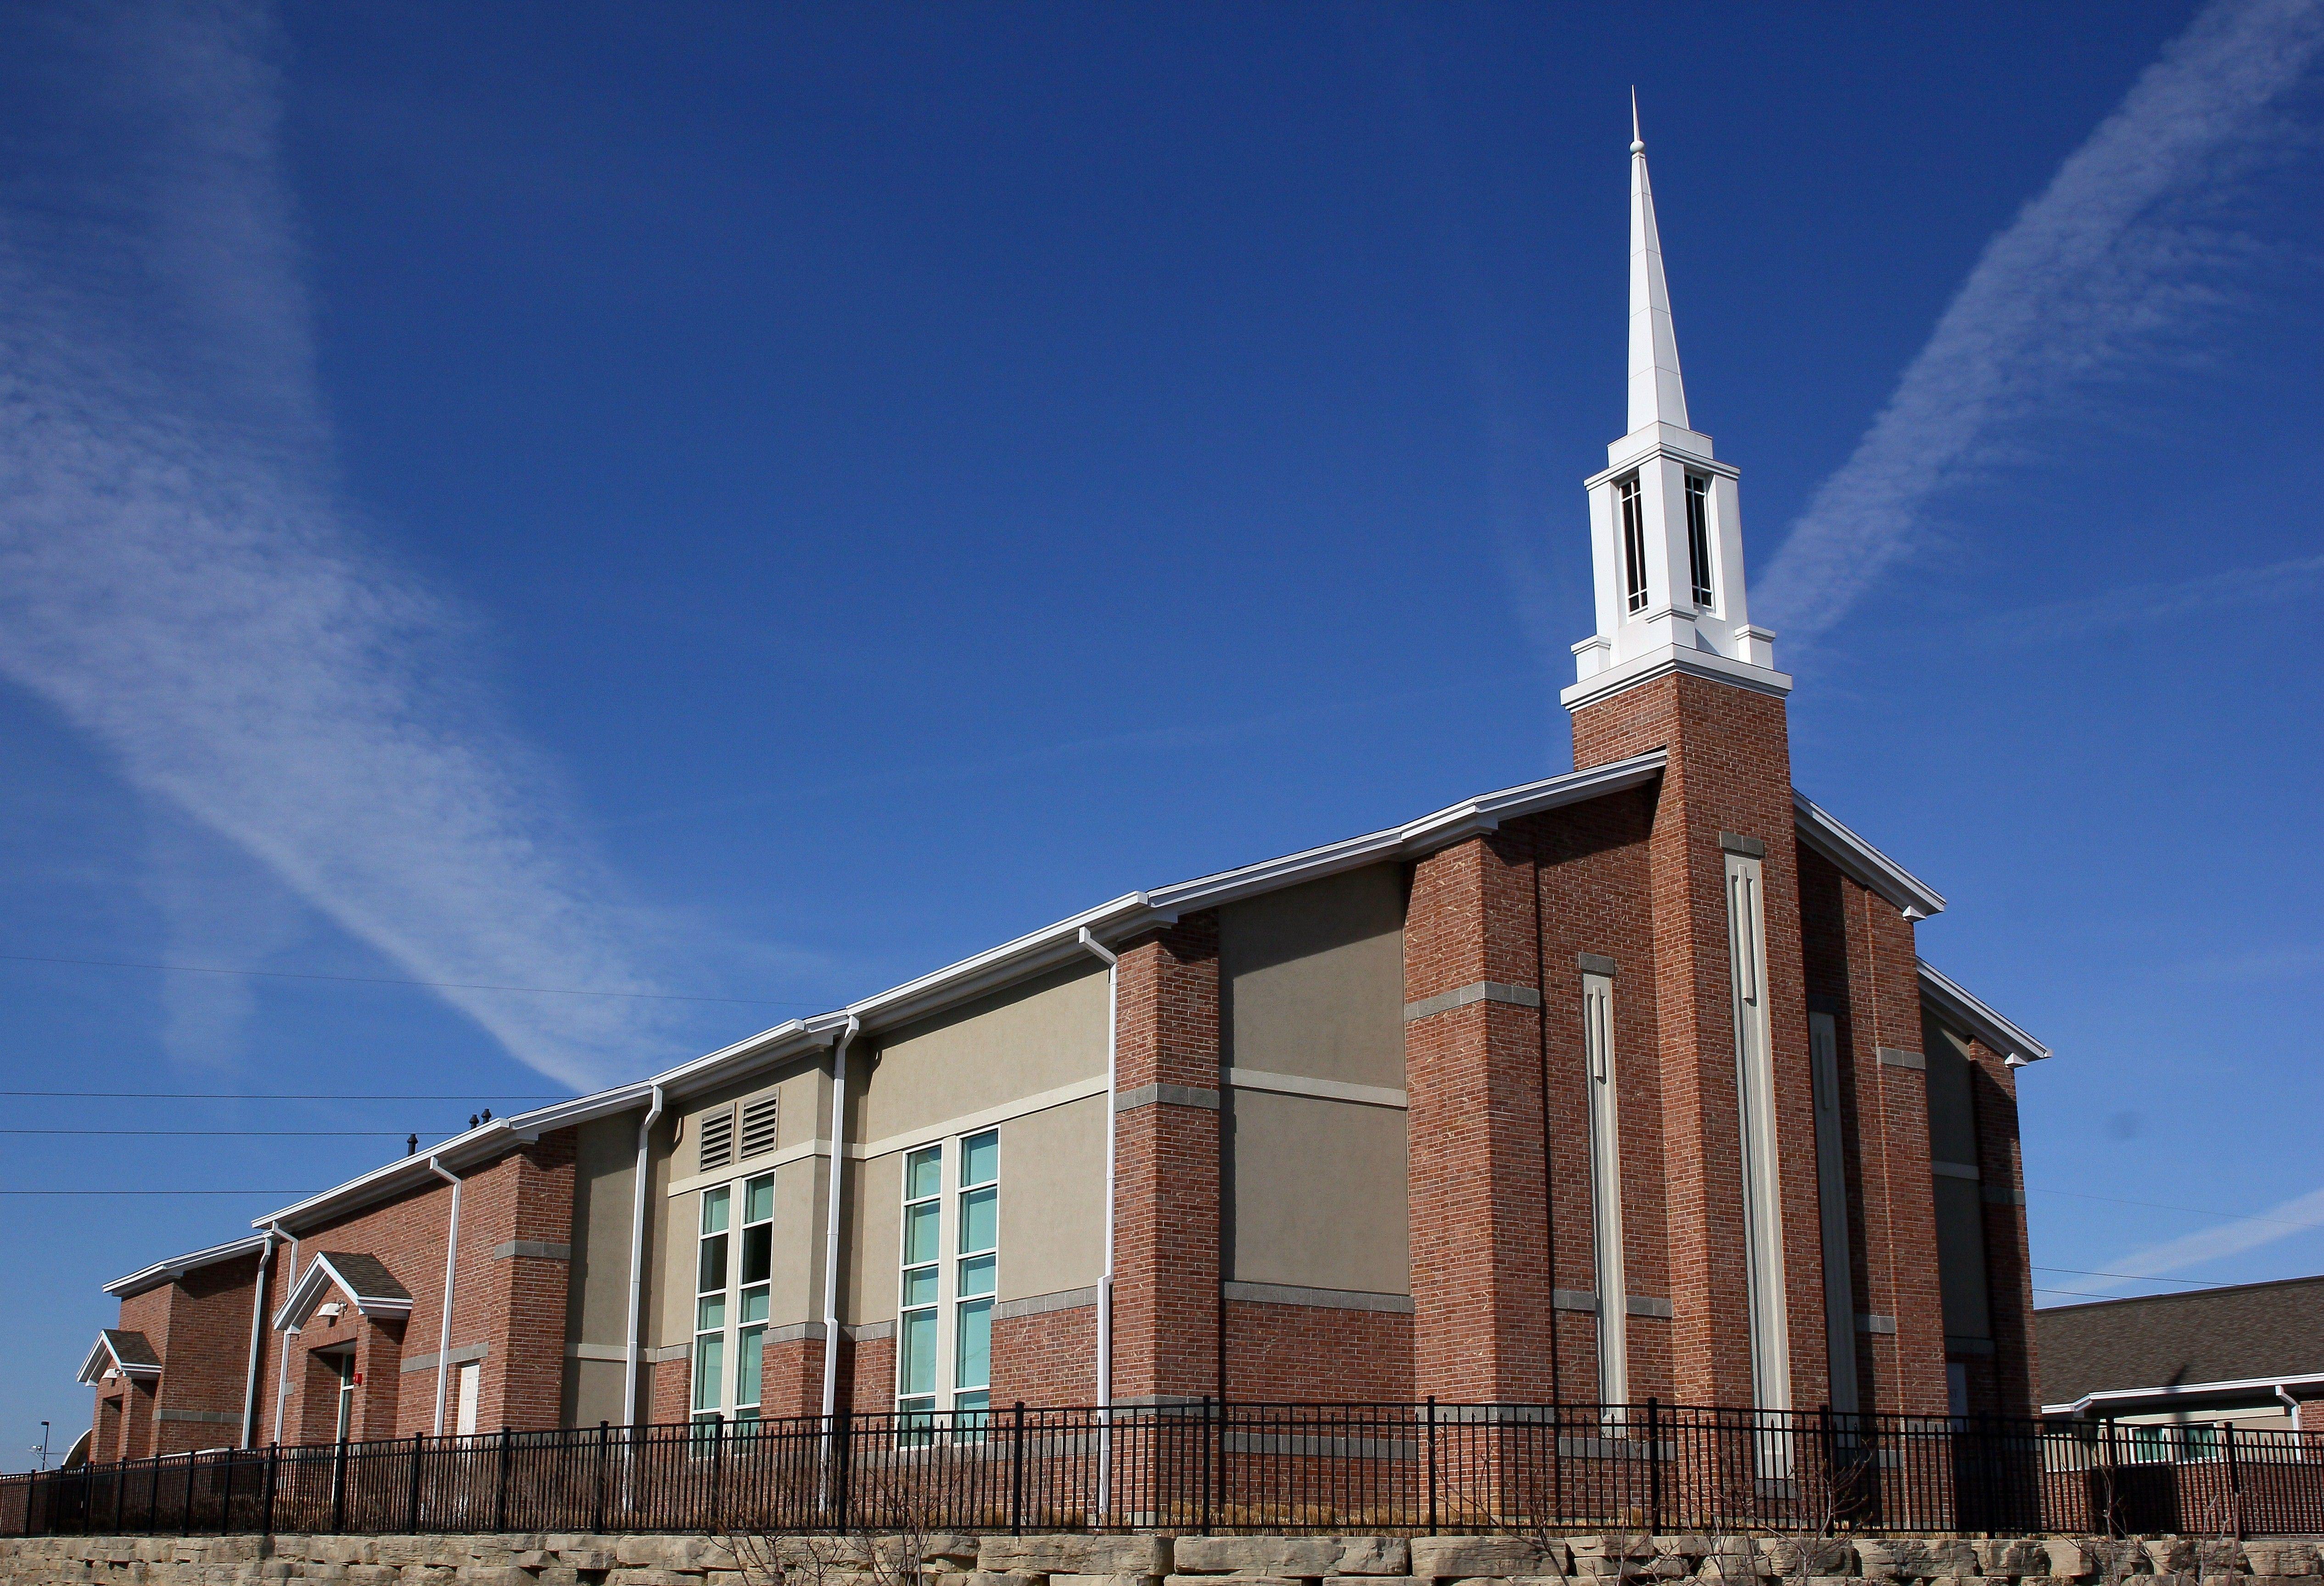 A chapel with a clear blue sky overhead in Kansas City, Missouri.